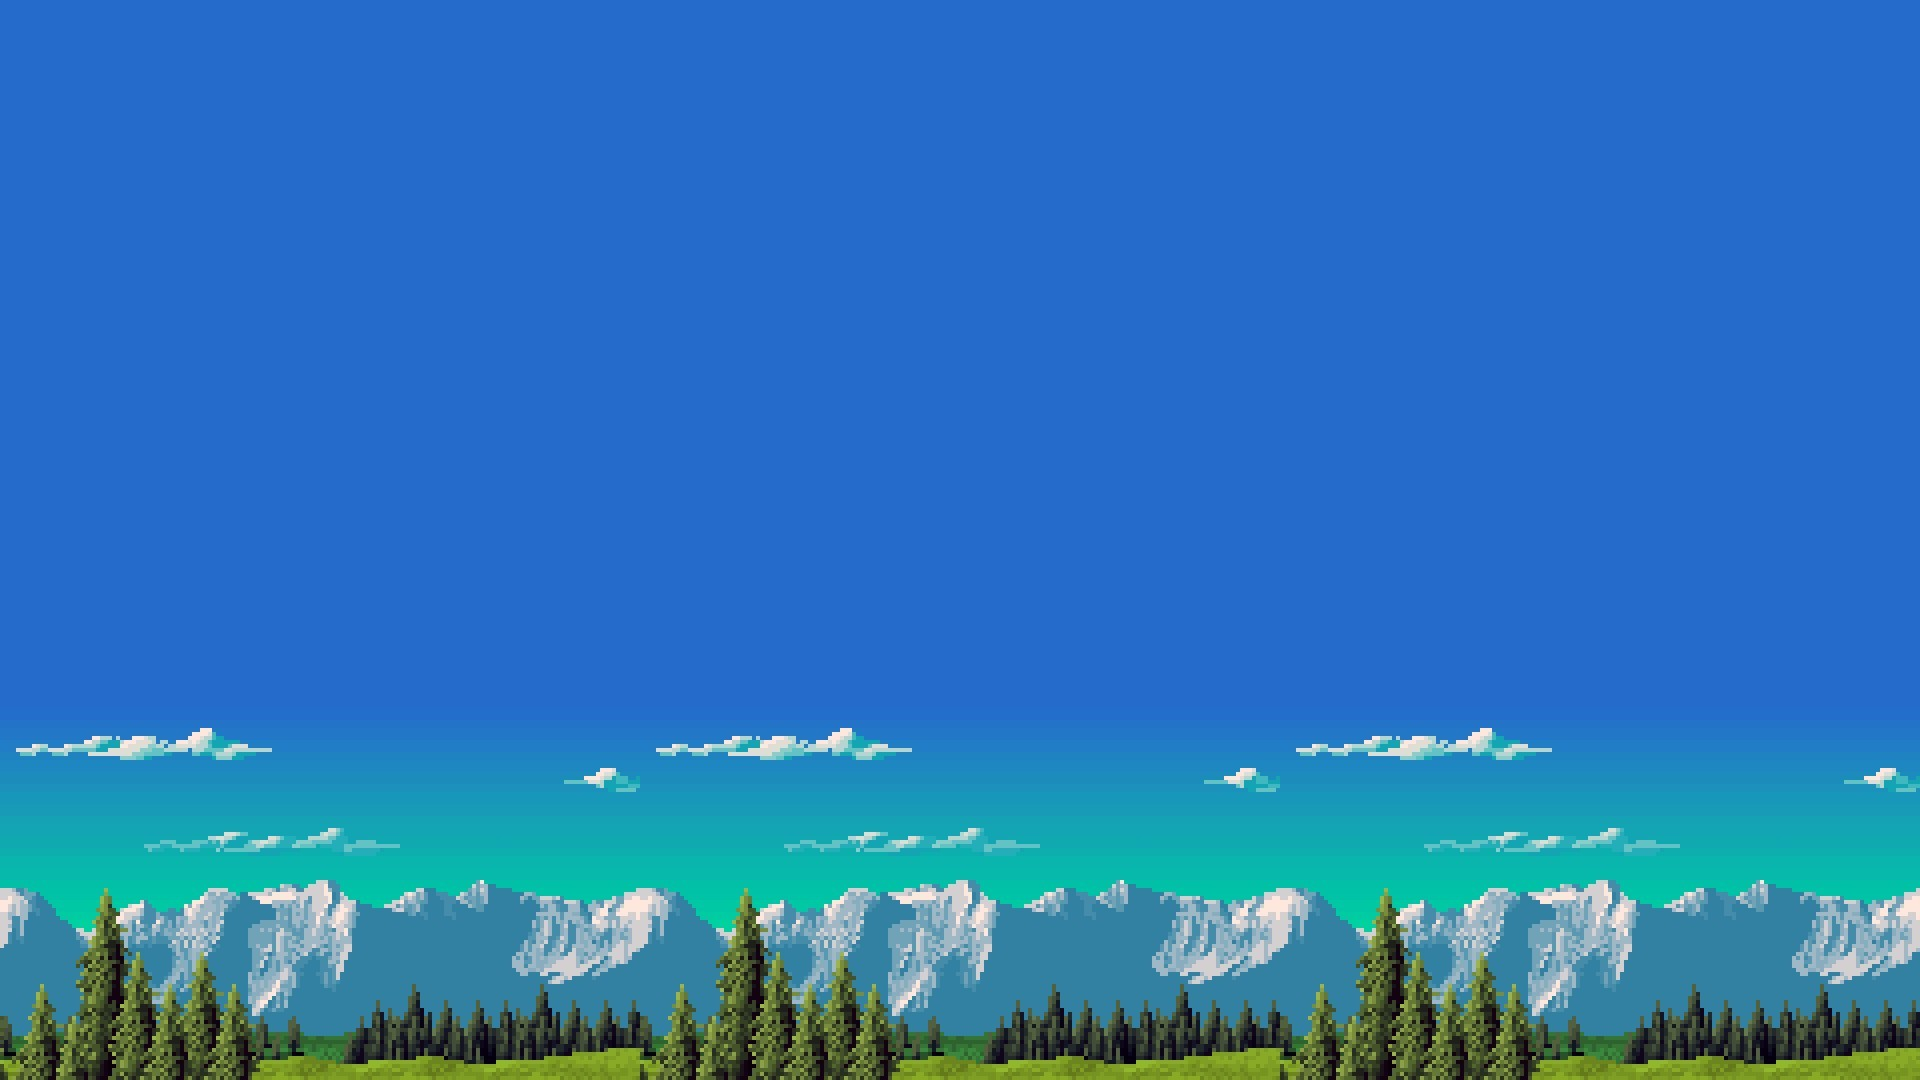 retro Games, Mountain, 8 bit. minimalism, Retro Games Wallpaper HD